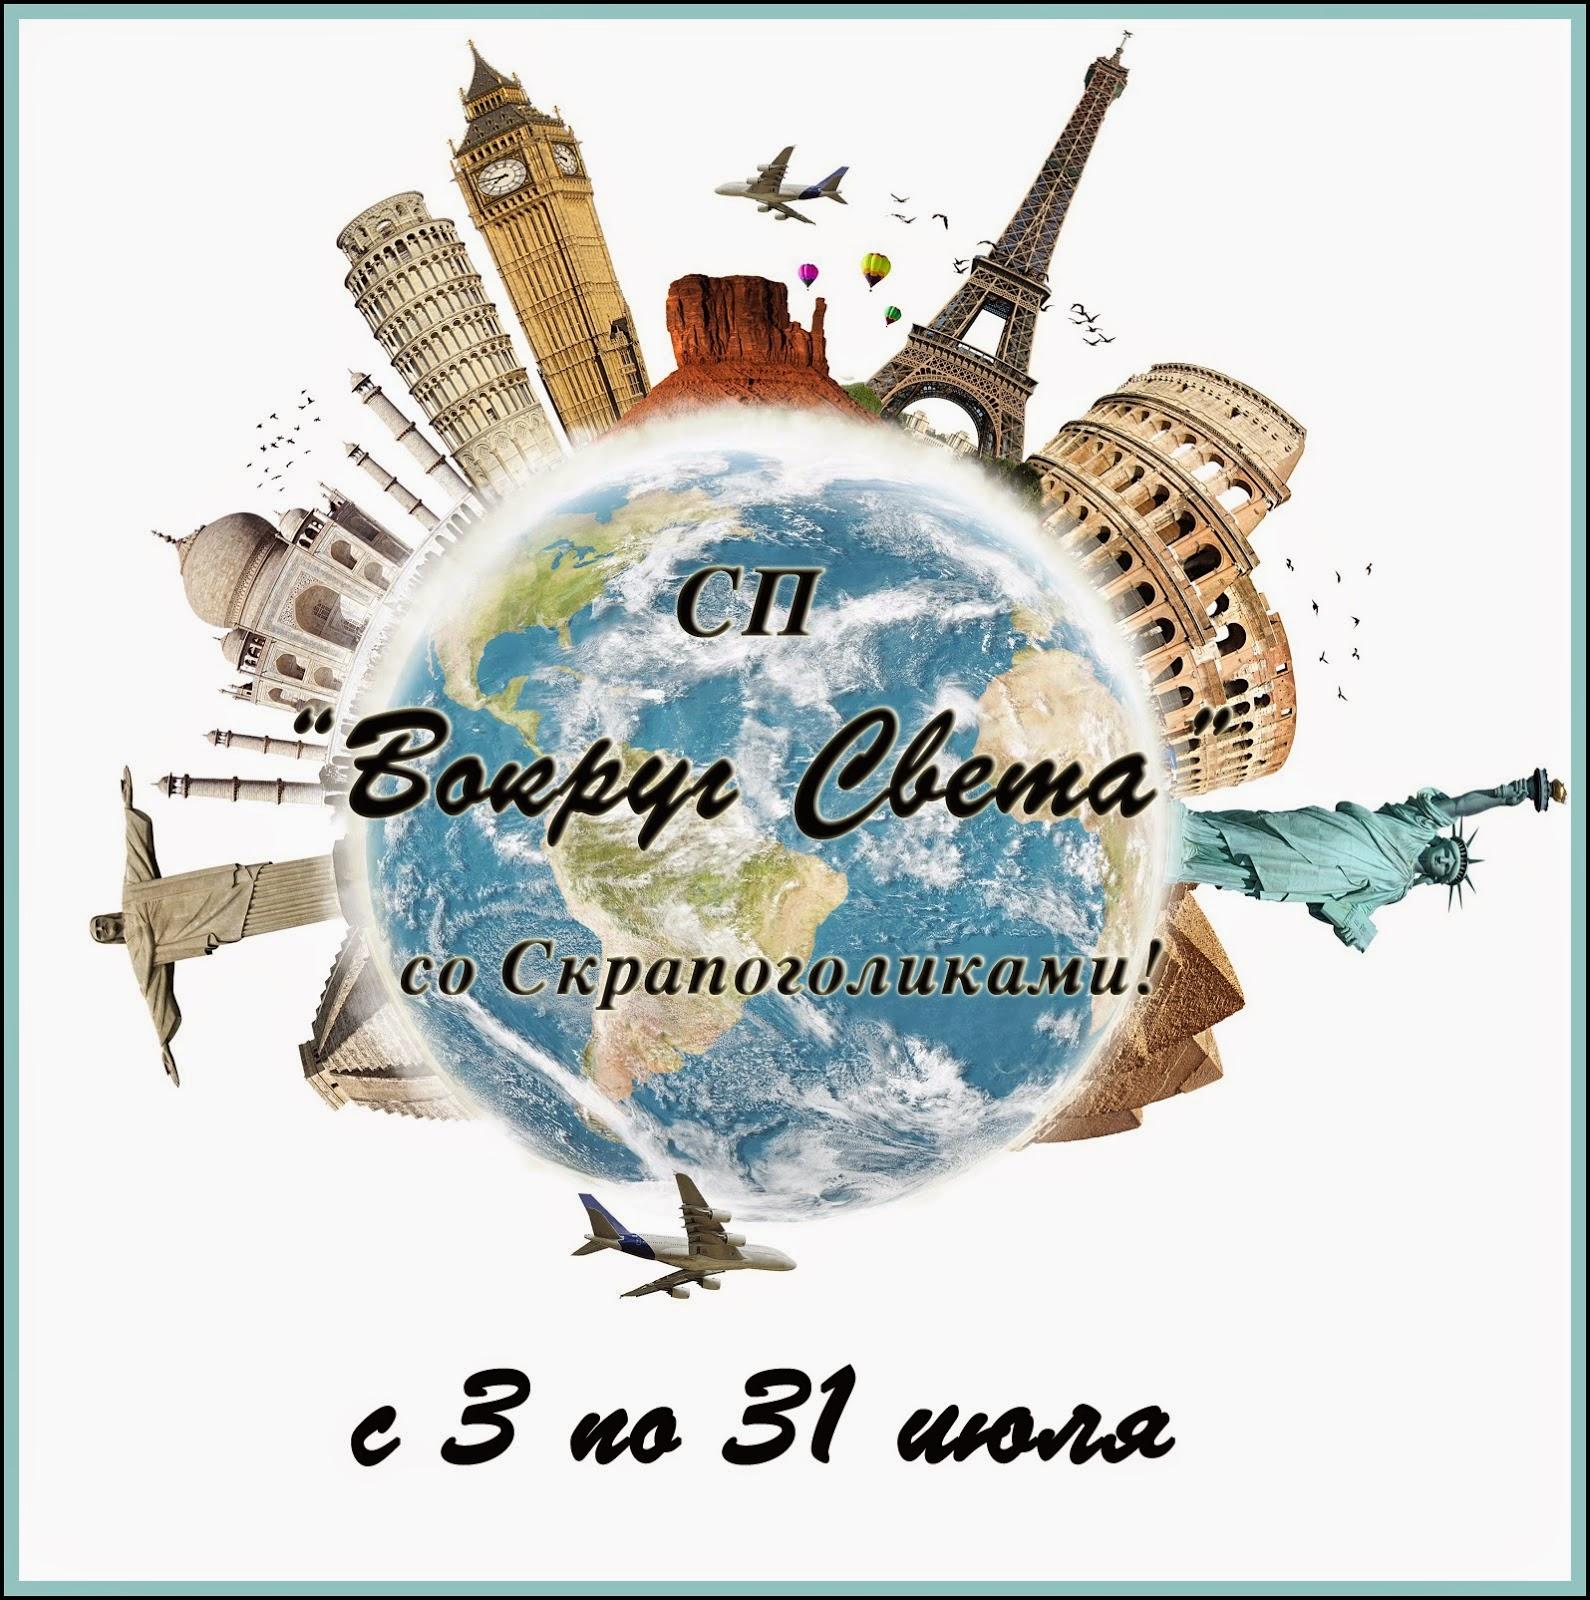 http://scrapogoliki-shop.blogspot.ru/2014/07/4.html